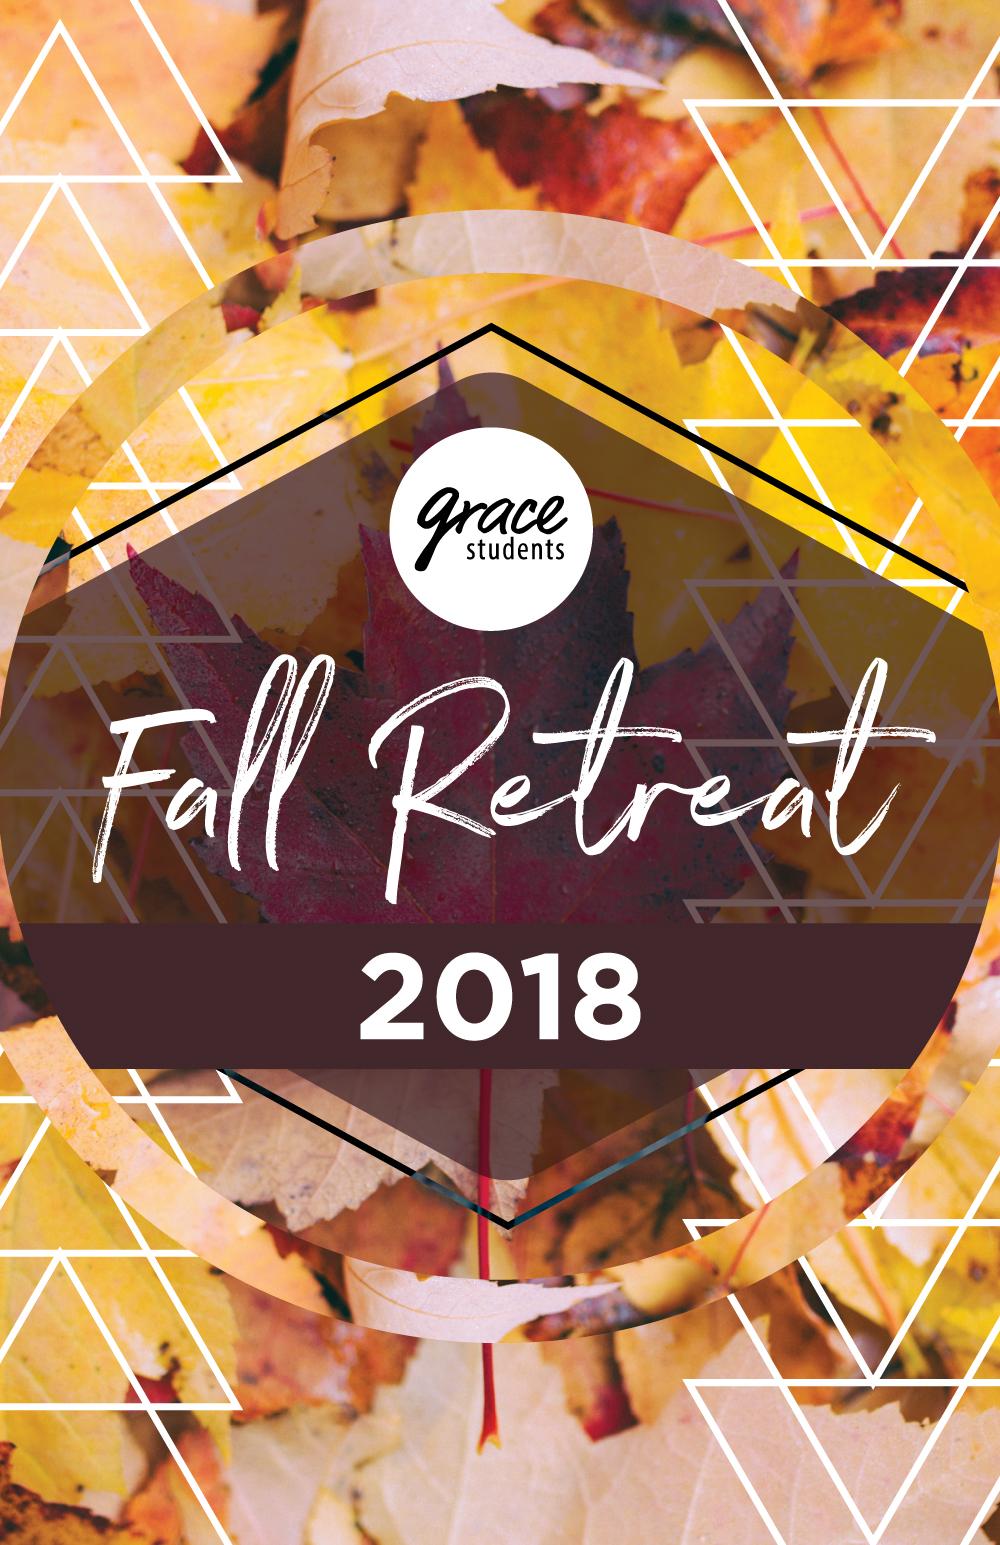 Fall-Retreat-booklet-cover.jpg